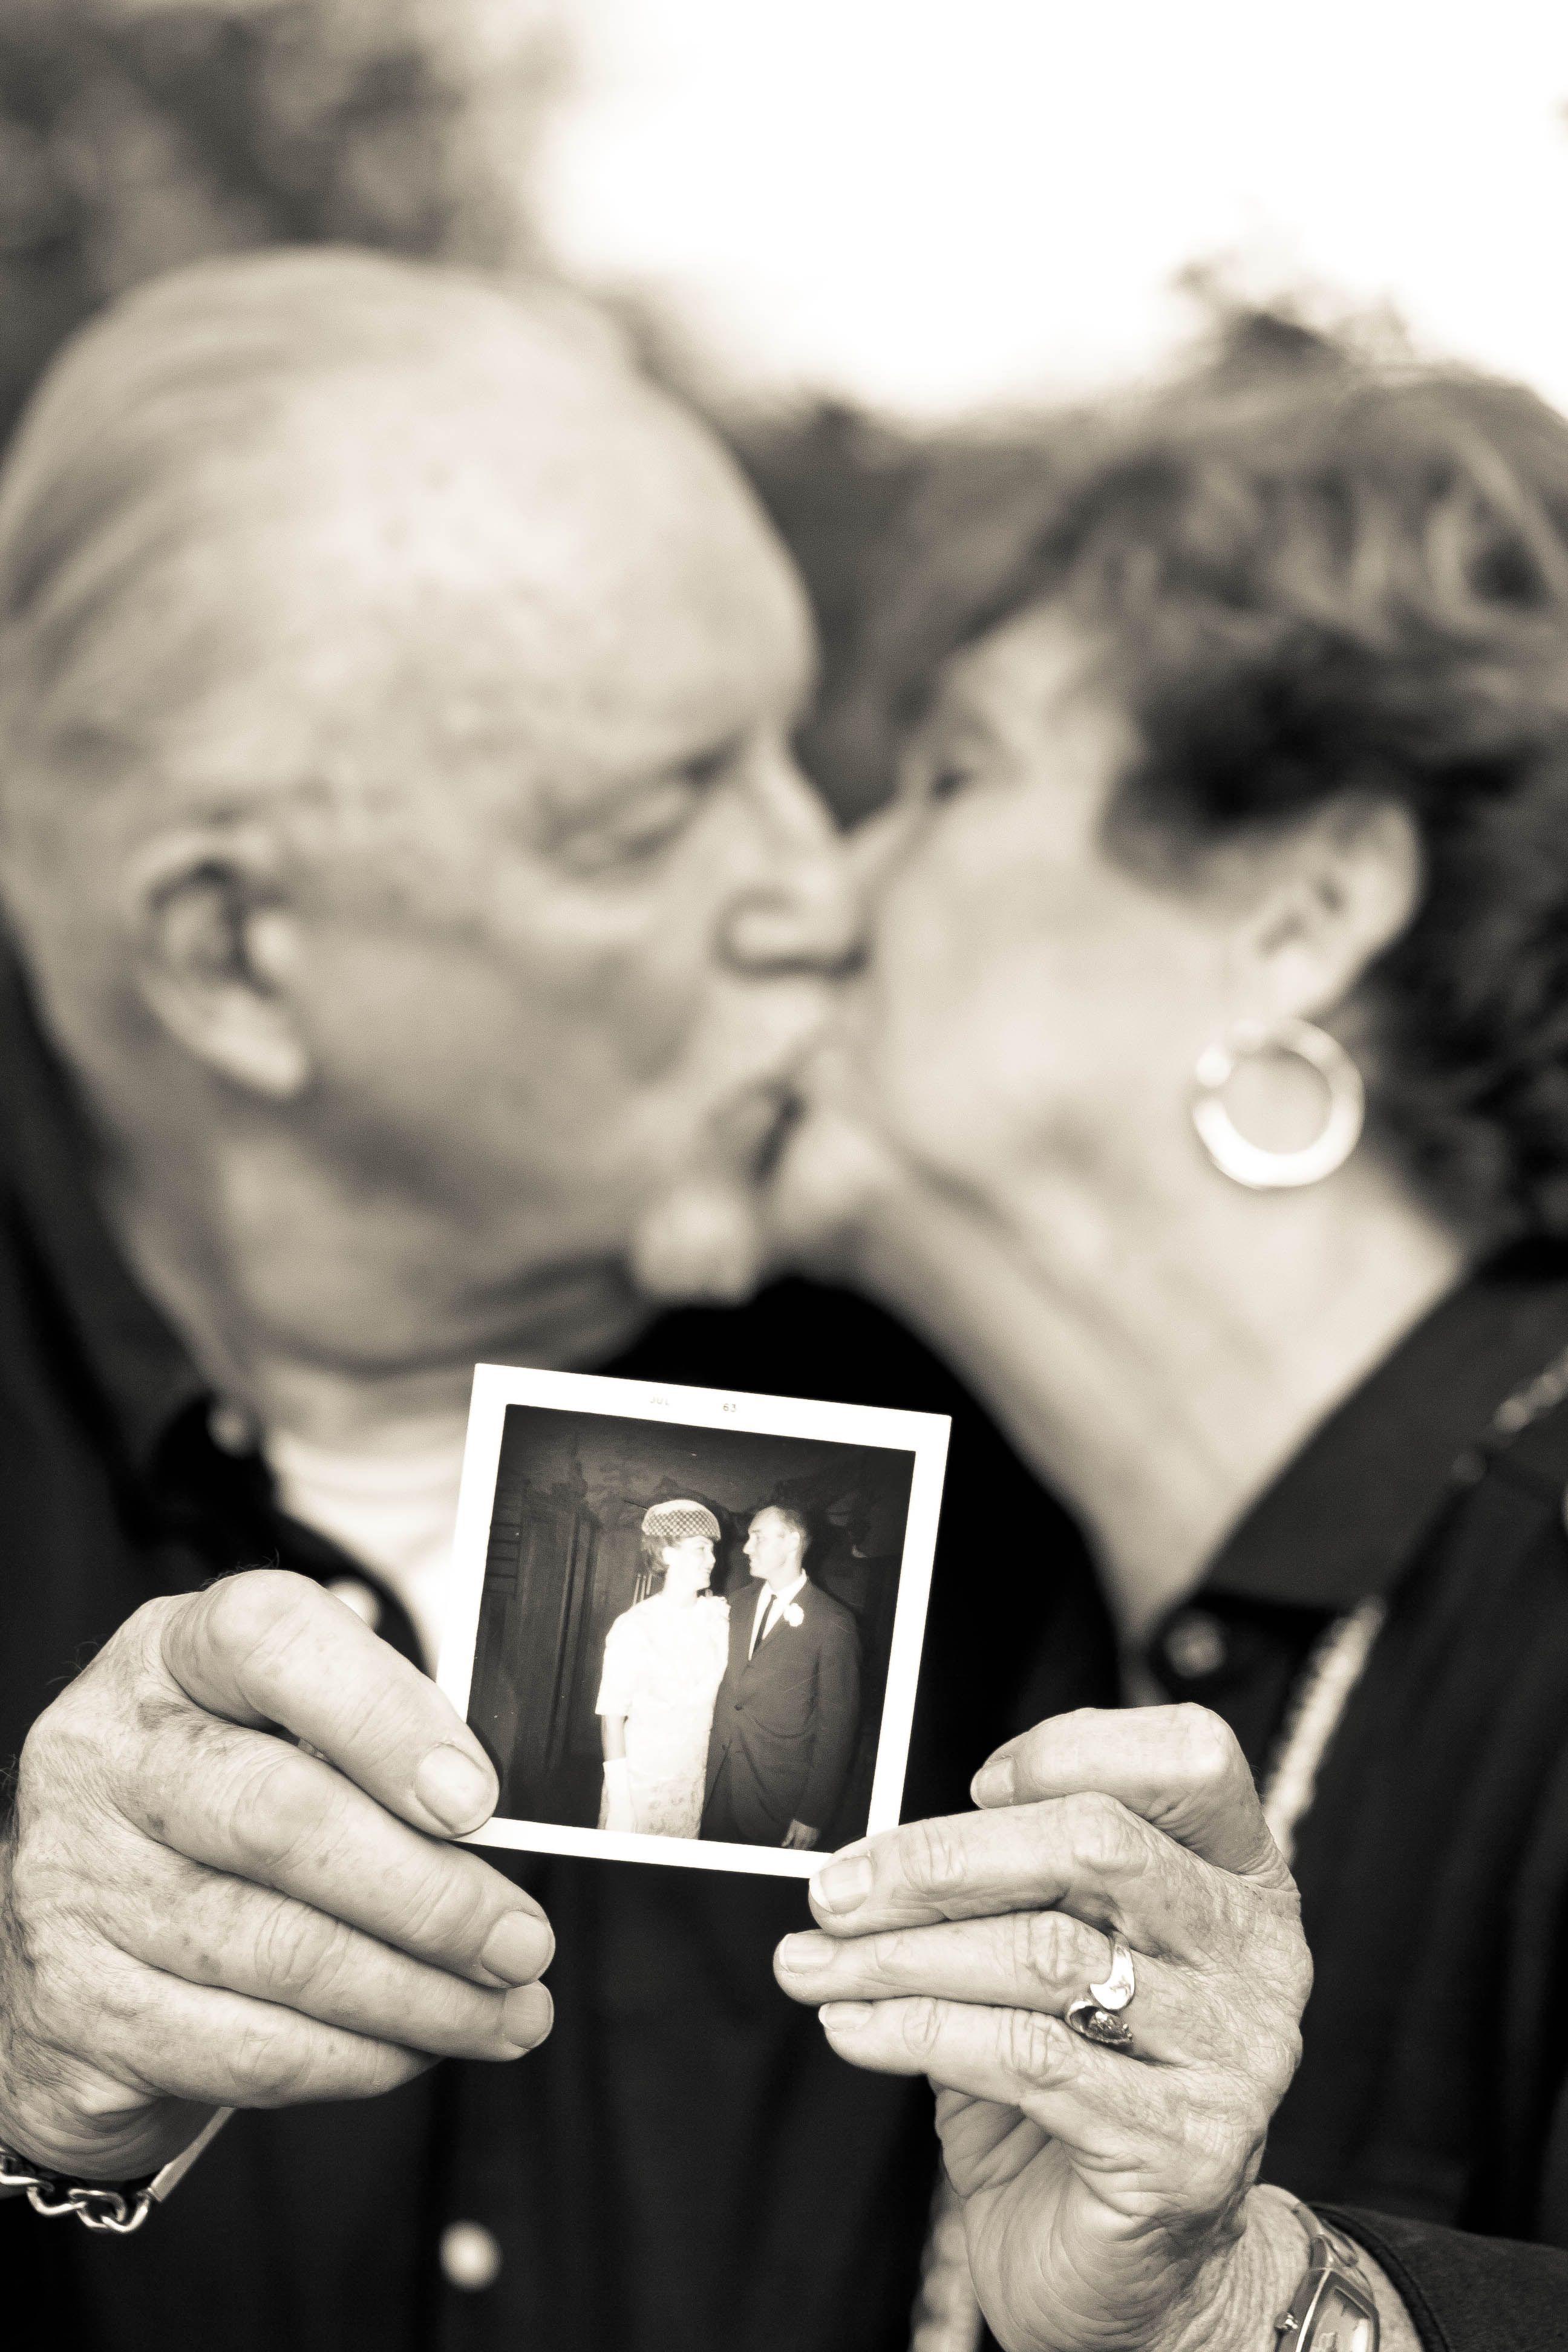 ashleyburnsphotography couples. So cute 50th wedding